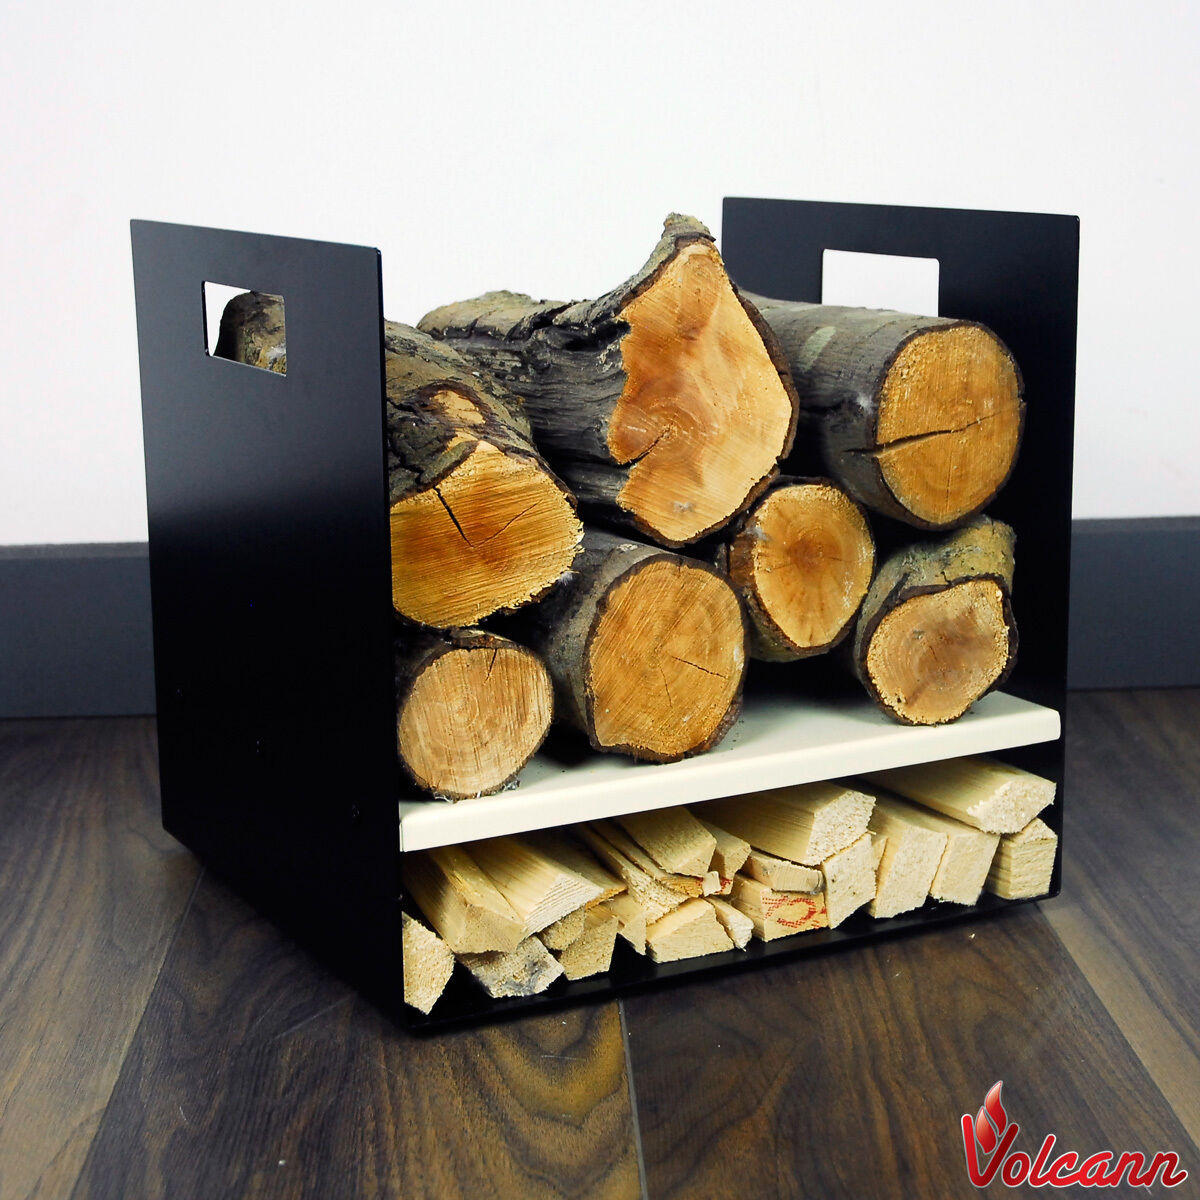 Compact 32cm Modern Firewood Log Basket Carrier For